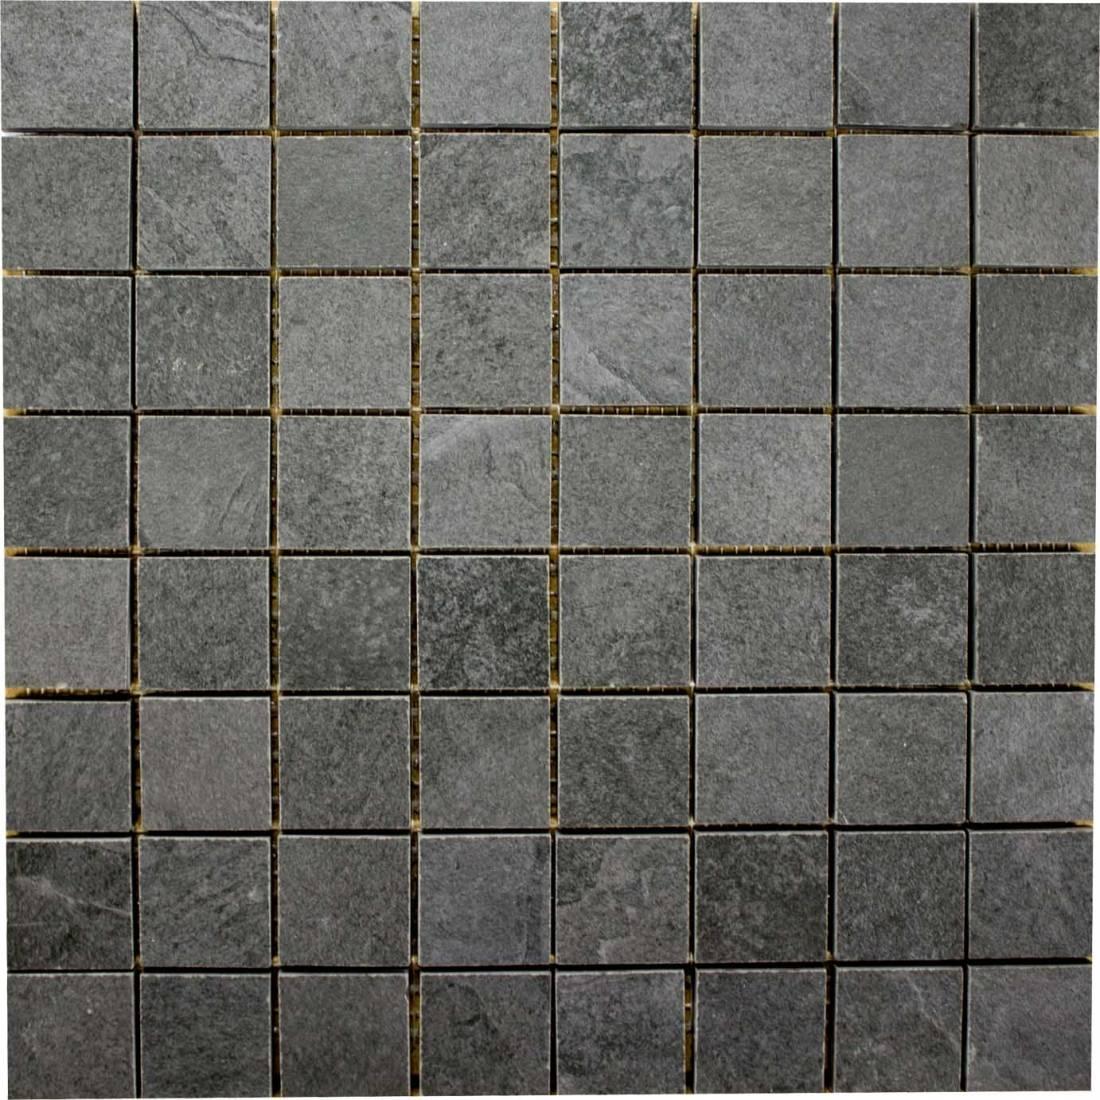 Lajedo Square 30x30 Black Matt R11 1